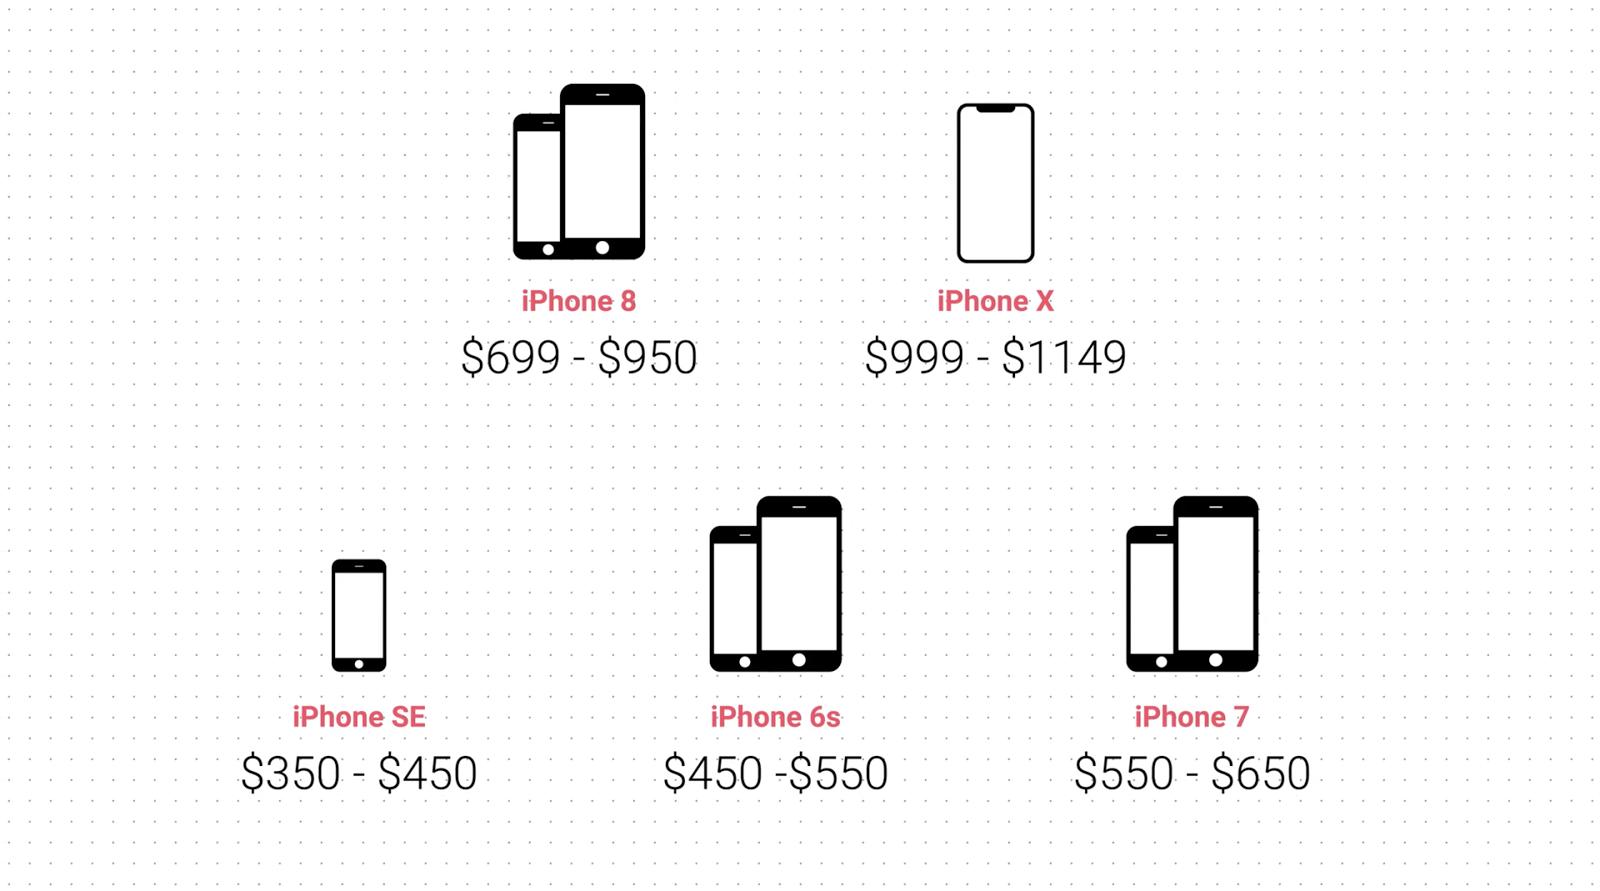 Quale iPhone acquistare nel 2017